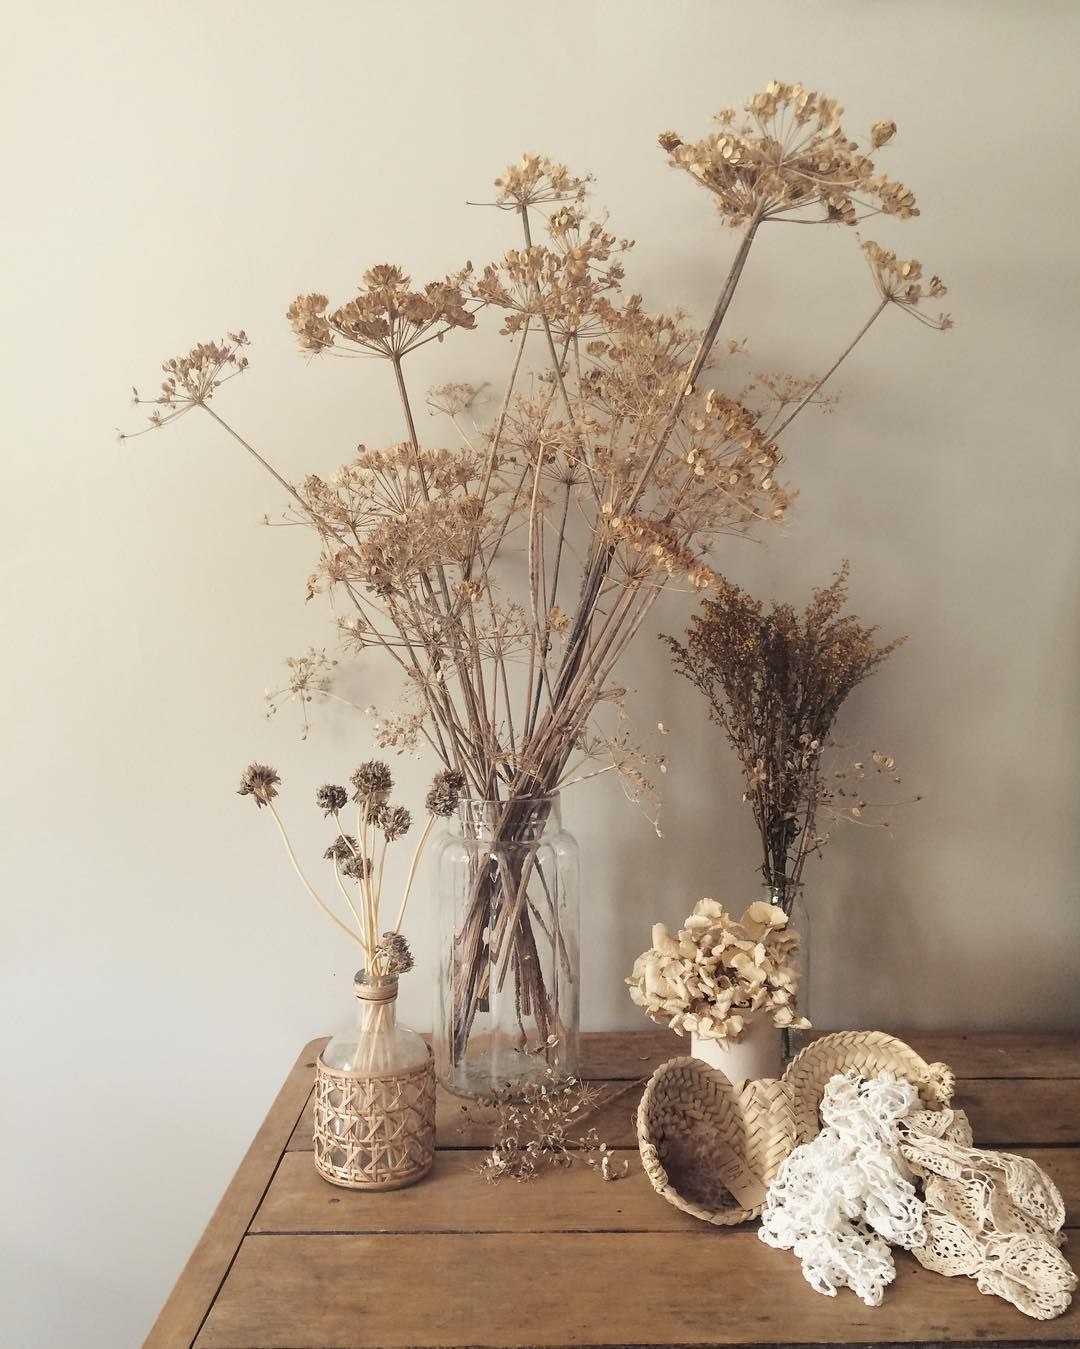 Simple Life Bunga Kering Bunga Liar Gambar Hiasan